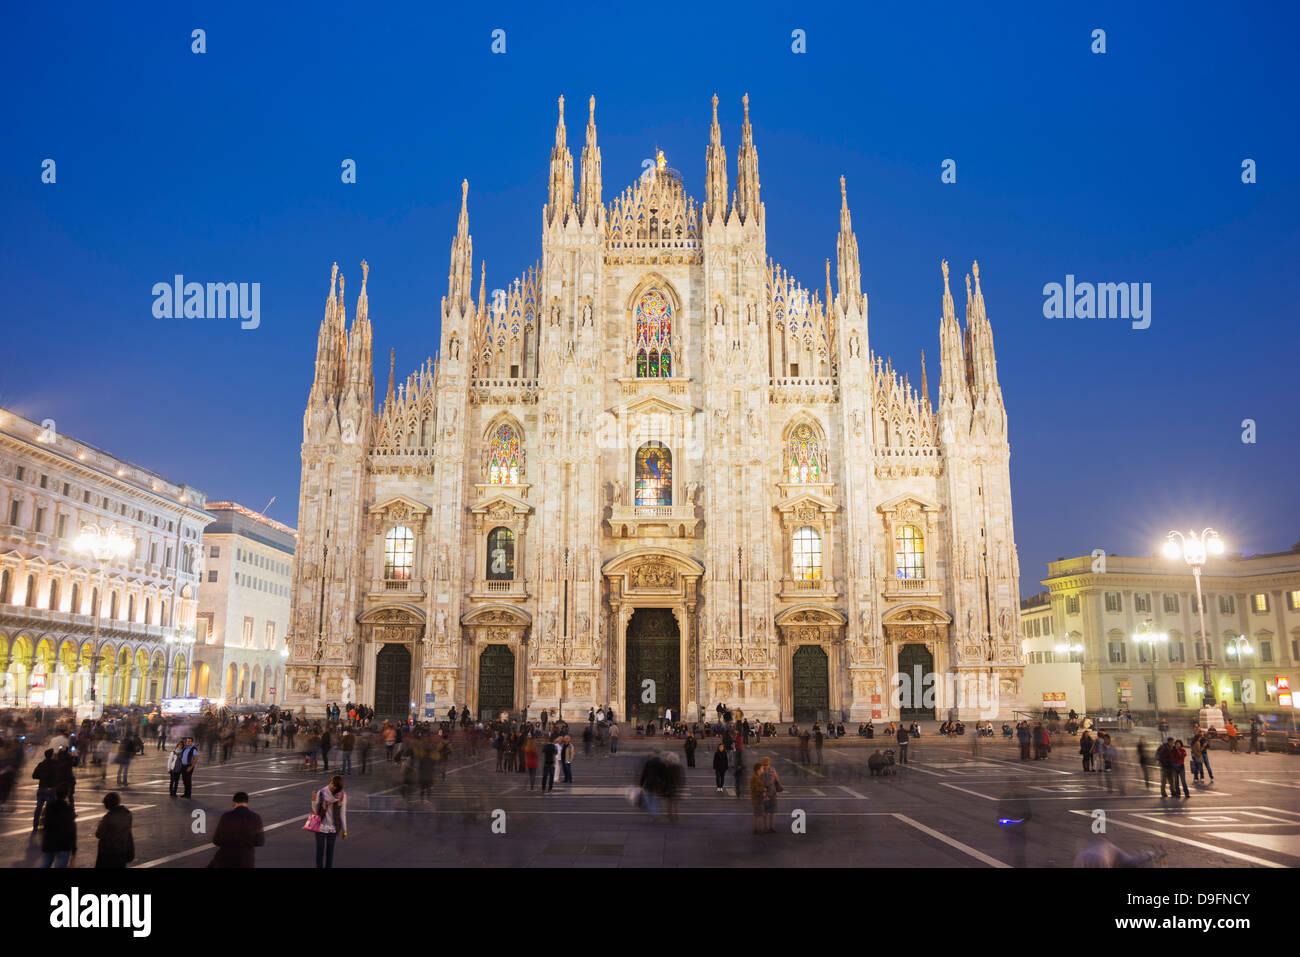 La cathédrale de Milan (Duomo), Milan, Lombardie, Italie Photo Stock